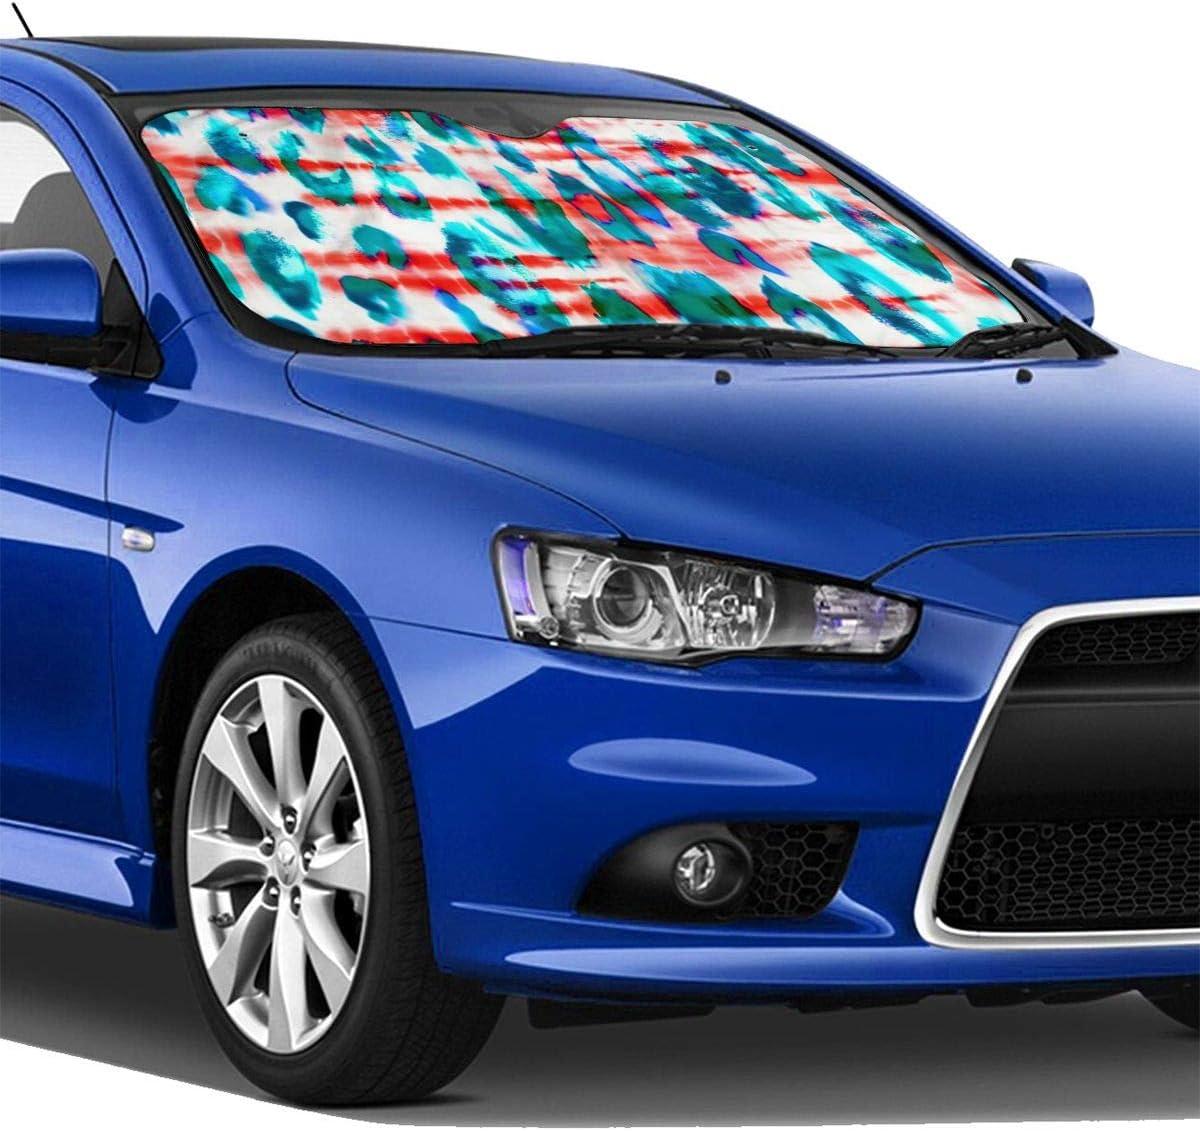 TMVFPYR Accordion Style Car SUV Front Windshield Purples Blues Mermaid Scales Shams Sunshade